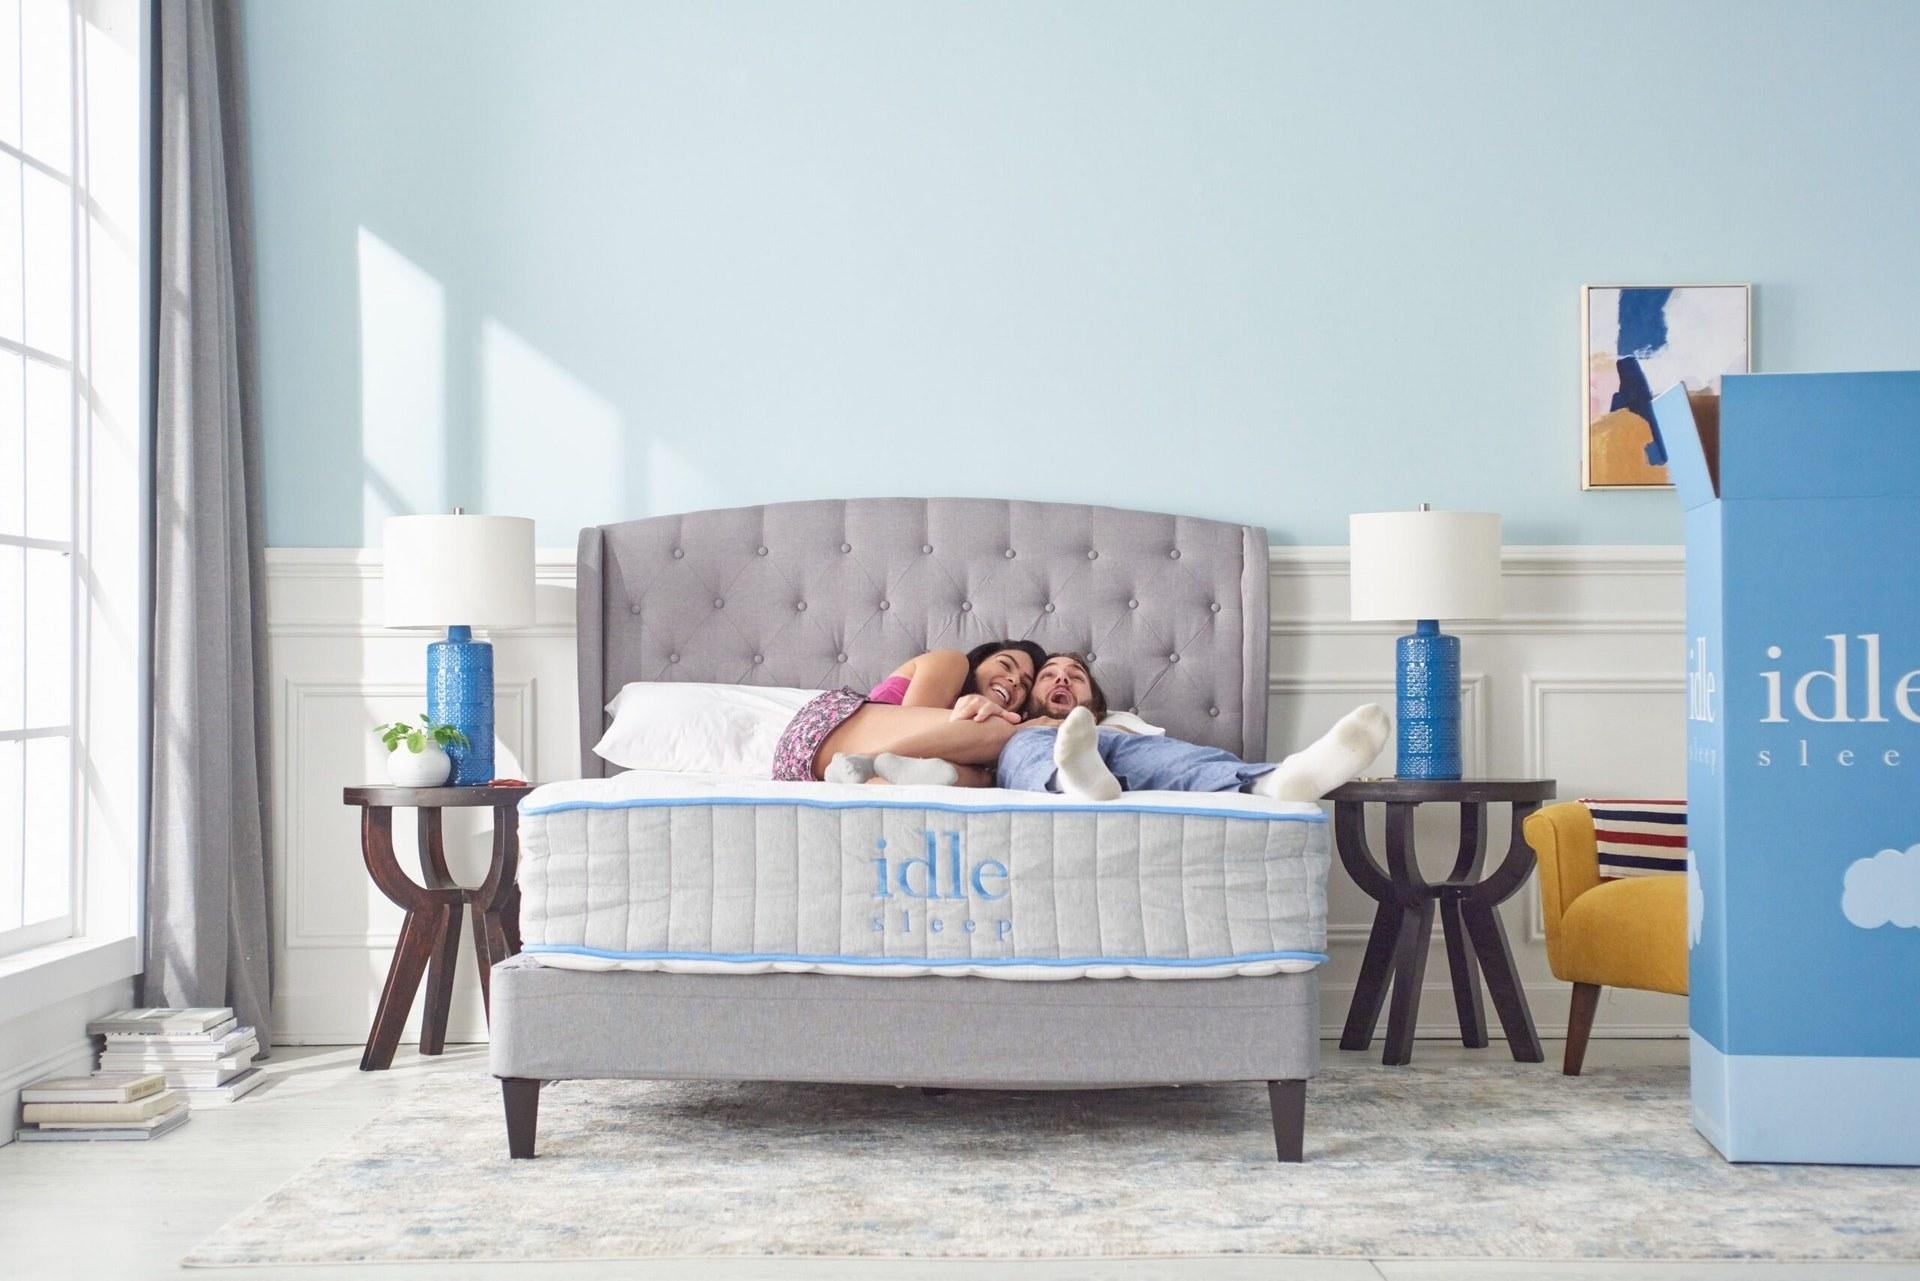 a couple lounging on an idle sleep mattress